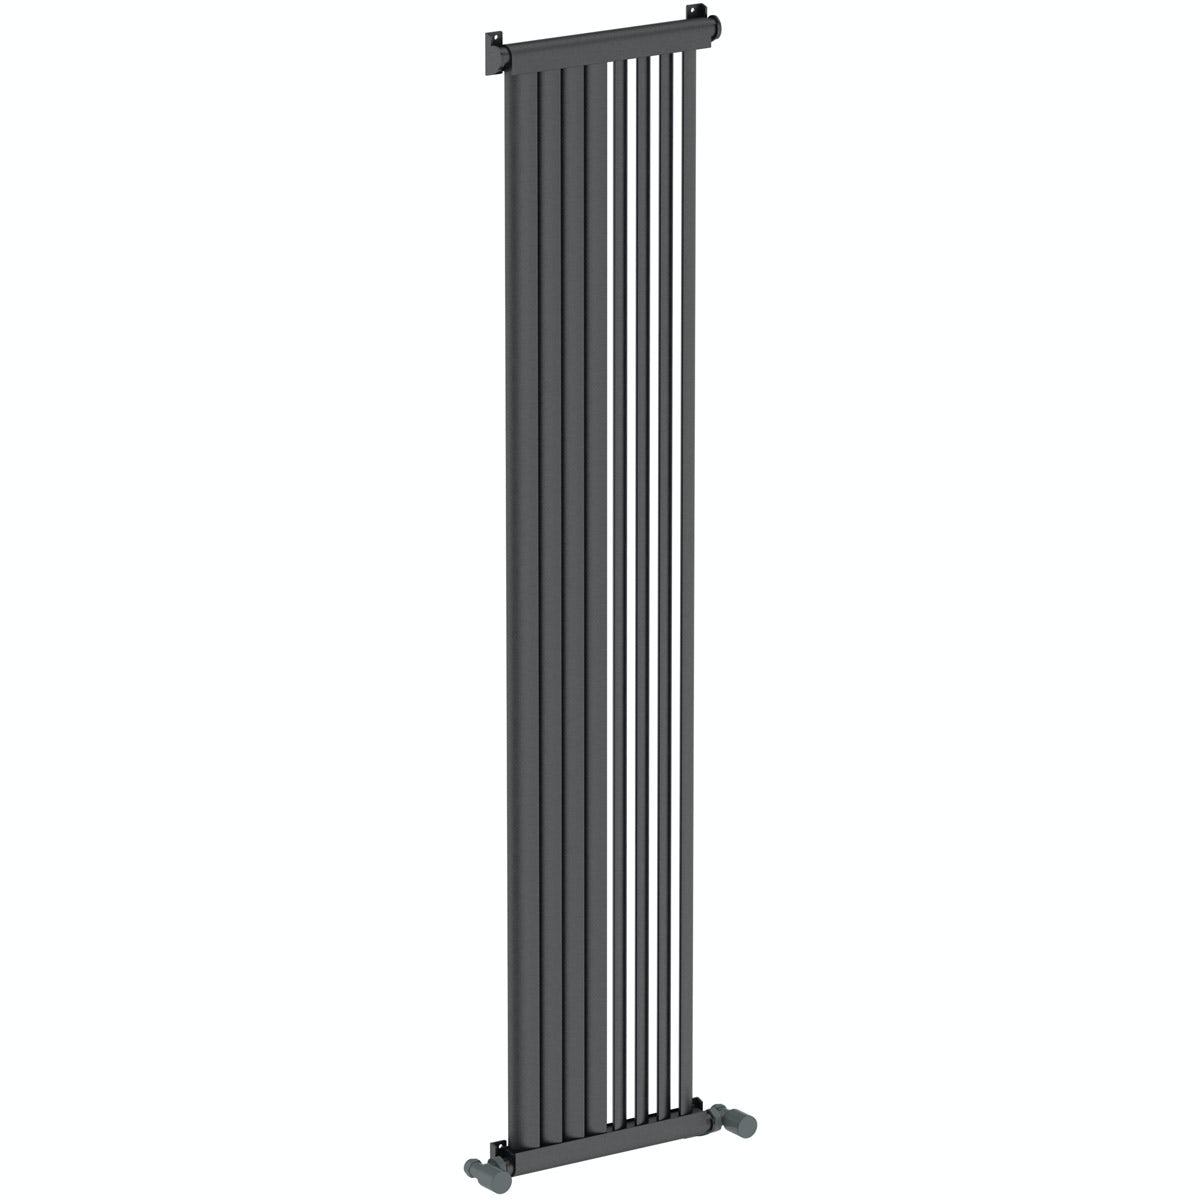 Mode Zephyra anthracite vertical radiator 1500 x 328